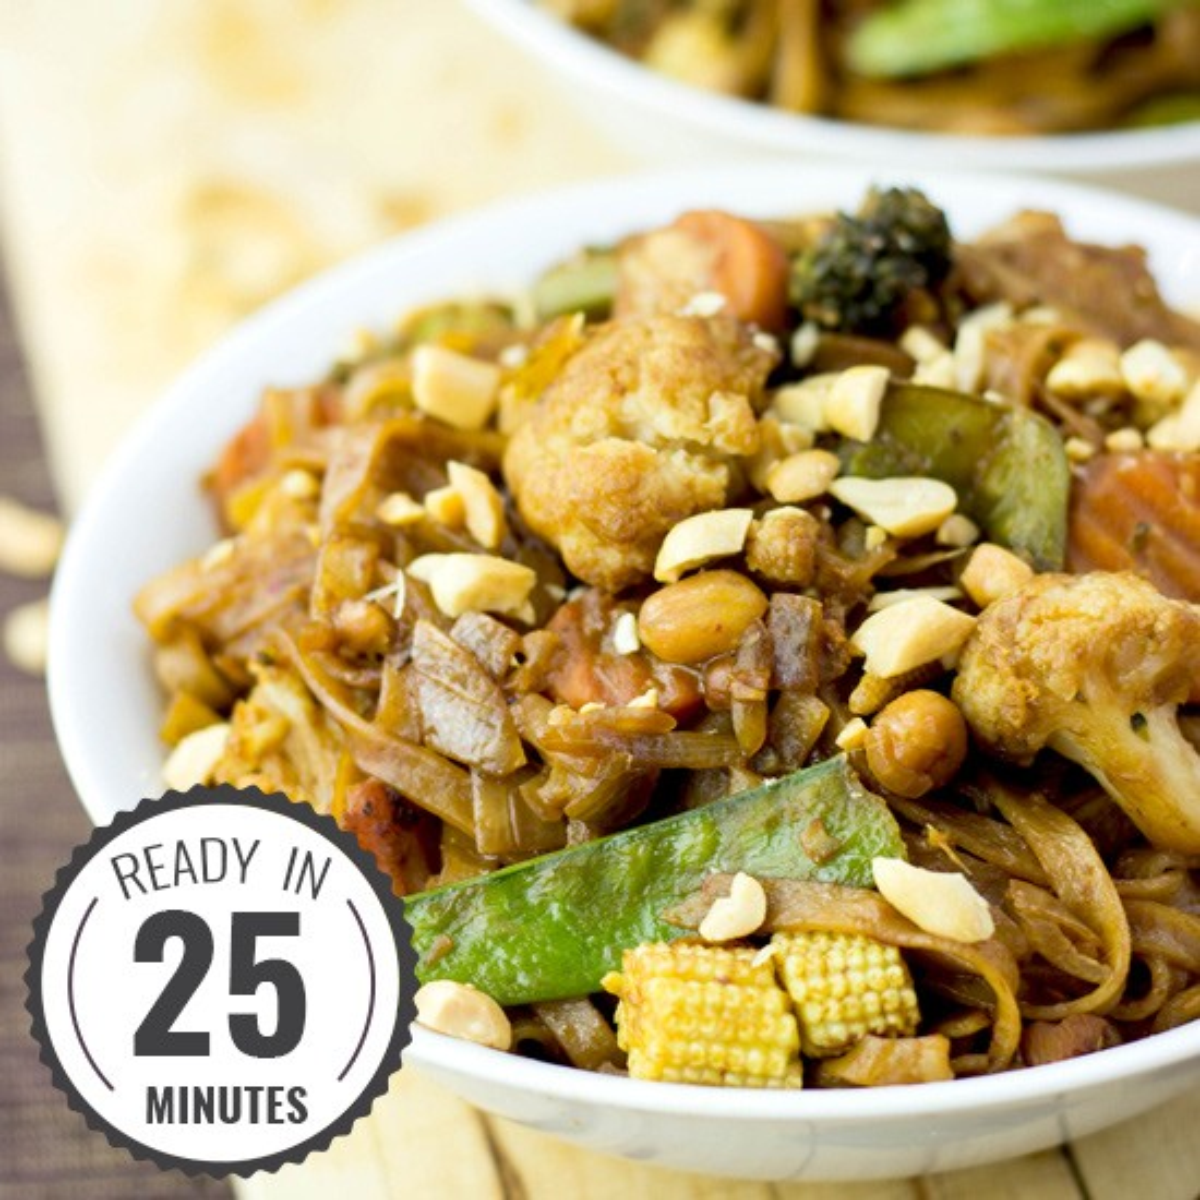 Easy Vegetable Stir Fry with Creamy Peanut Sauce #stirfry #peanut #vegan | hurrythefoodup.com